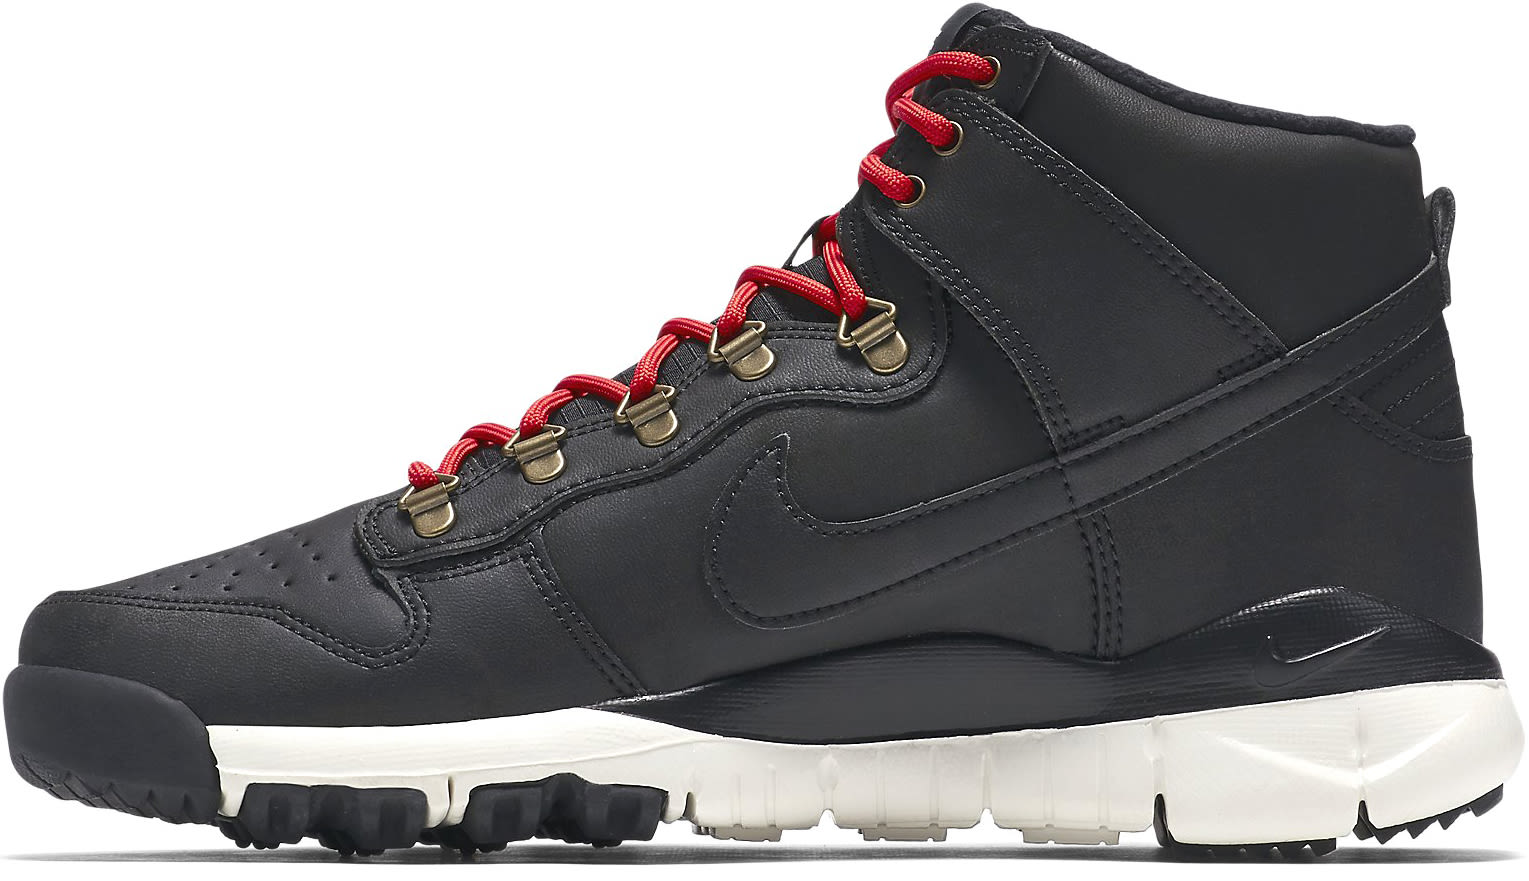 ebb3b97cafa02 Nike SB Dunk High Hiking Boots - thumbnail 2